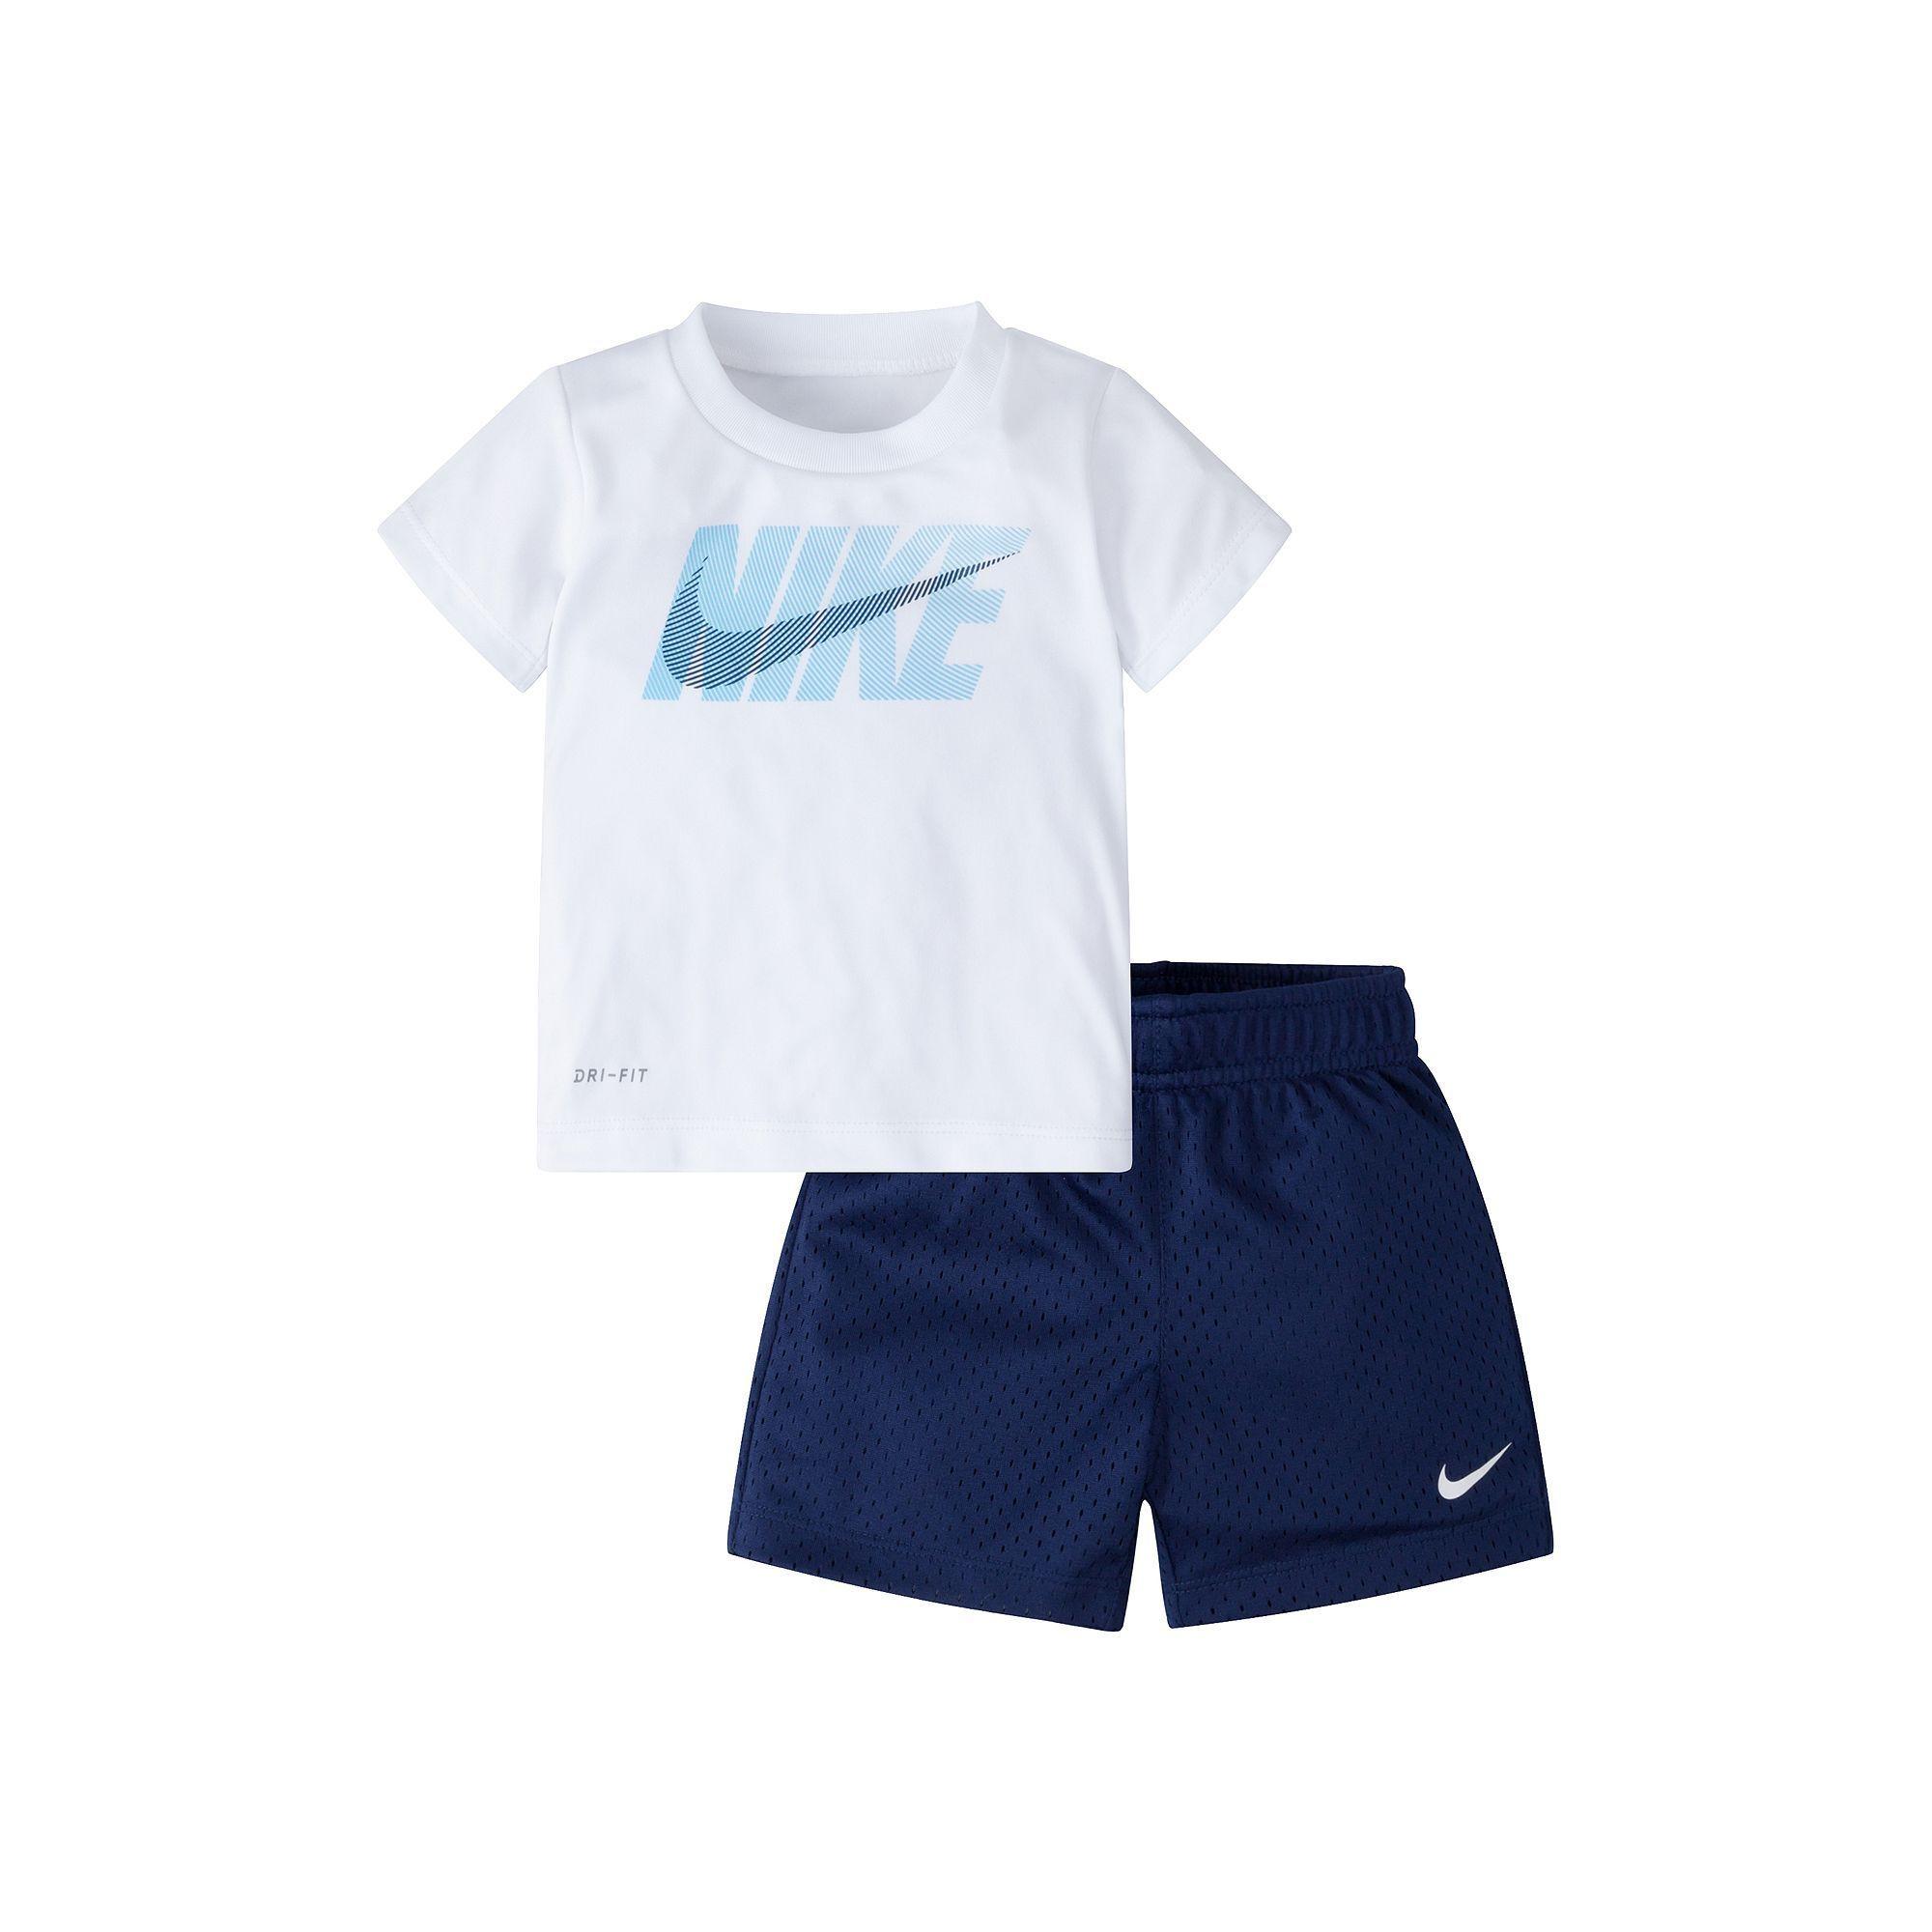 0fdfe84e65b9 Boys 4-7 Nike Tee   Shorts Set in 2019